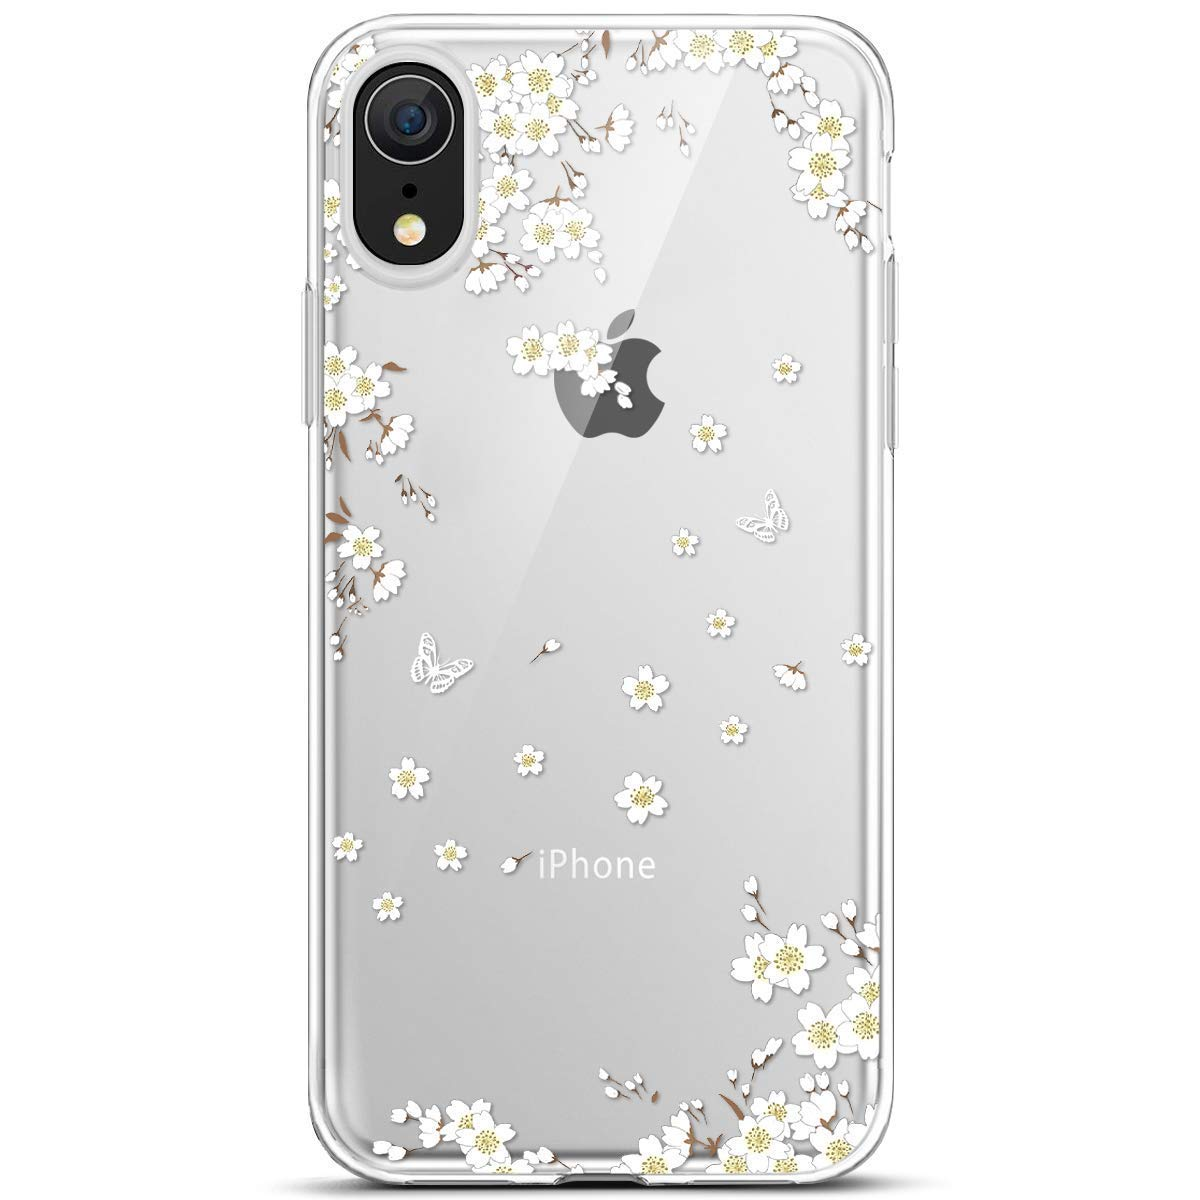 iPhone XR Hü lle, iPhone XR Silikon Hü lle, Ysimee Schutzhü lle Ultradü nn Handyhü lle Transparent Weiche Silikon TPU Rü ckschale Bumper Case Ultra Slim Scratch-Resistant Stoß fest Bumper Cover, Mandala iPhone XR 6.1